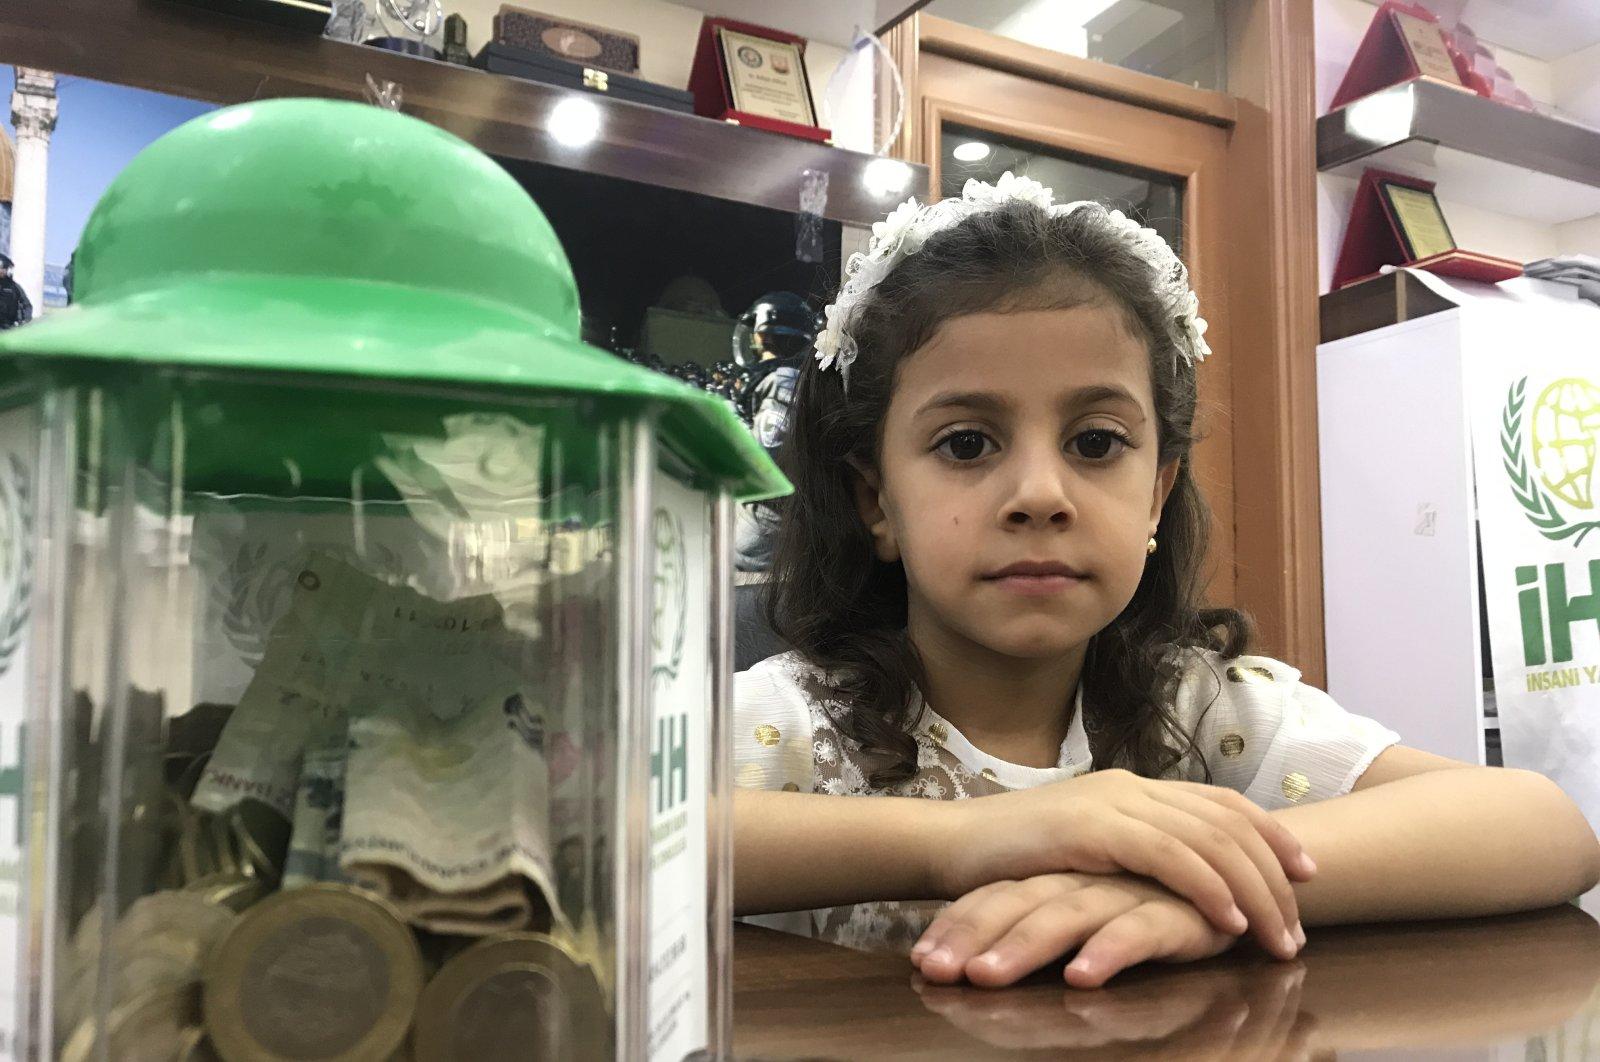 A Syrian orphan girl poses with her donation, in Şanlıurfa, southeastern Turkey, Aug. 16, 2021. (AA PHOTO)